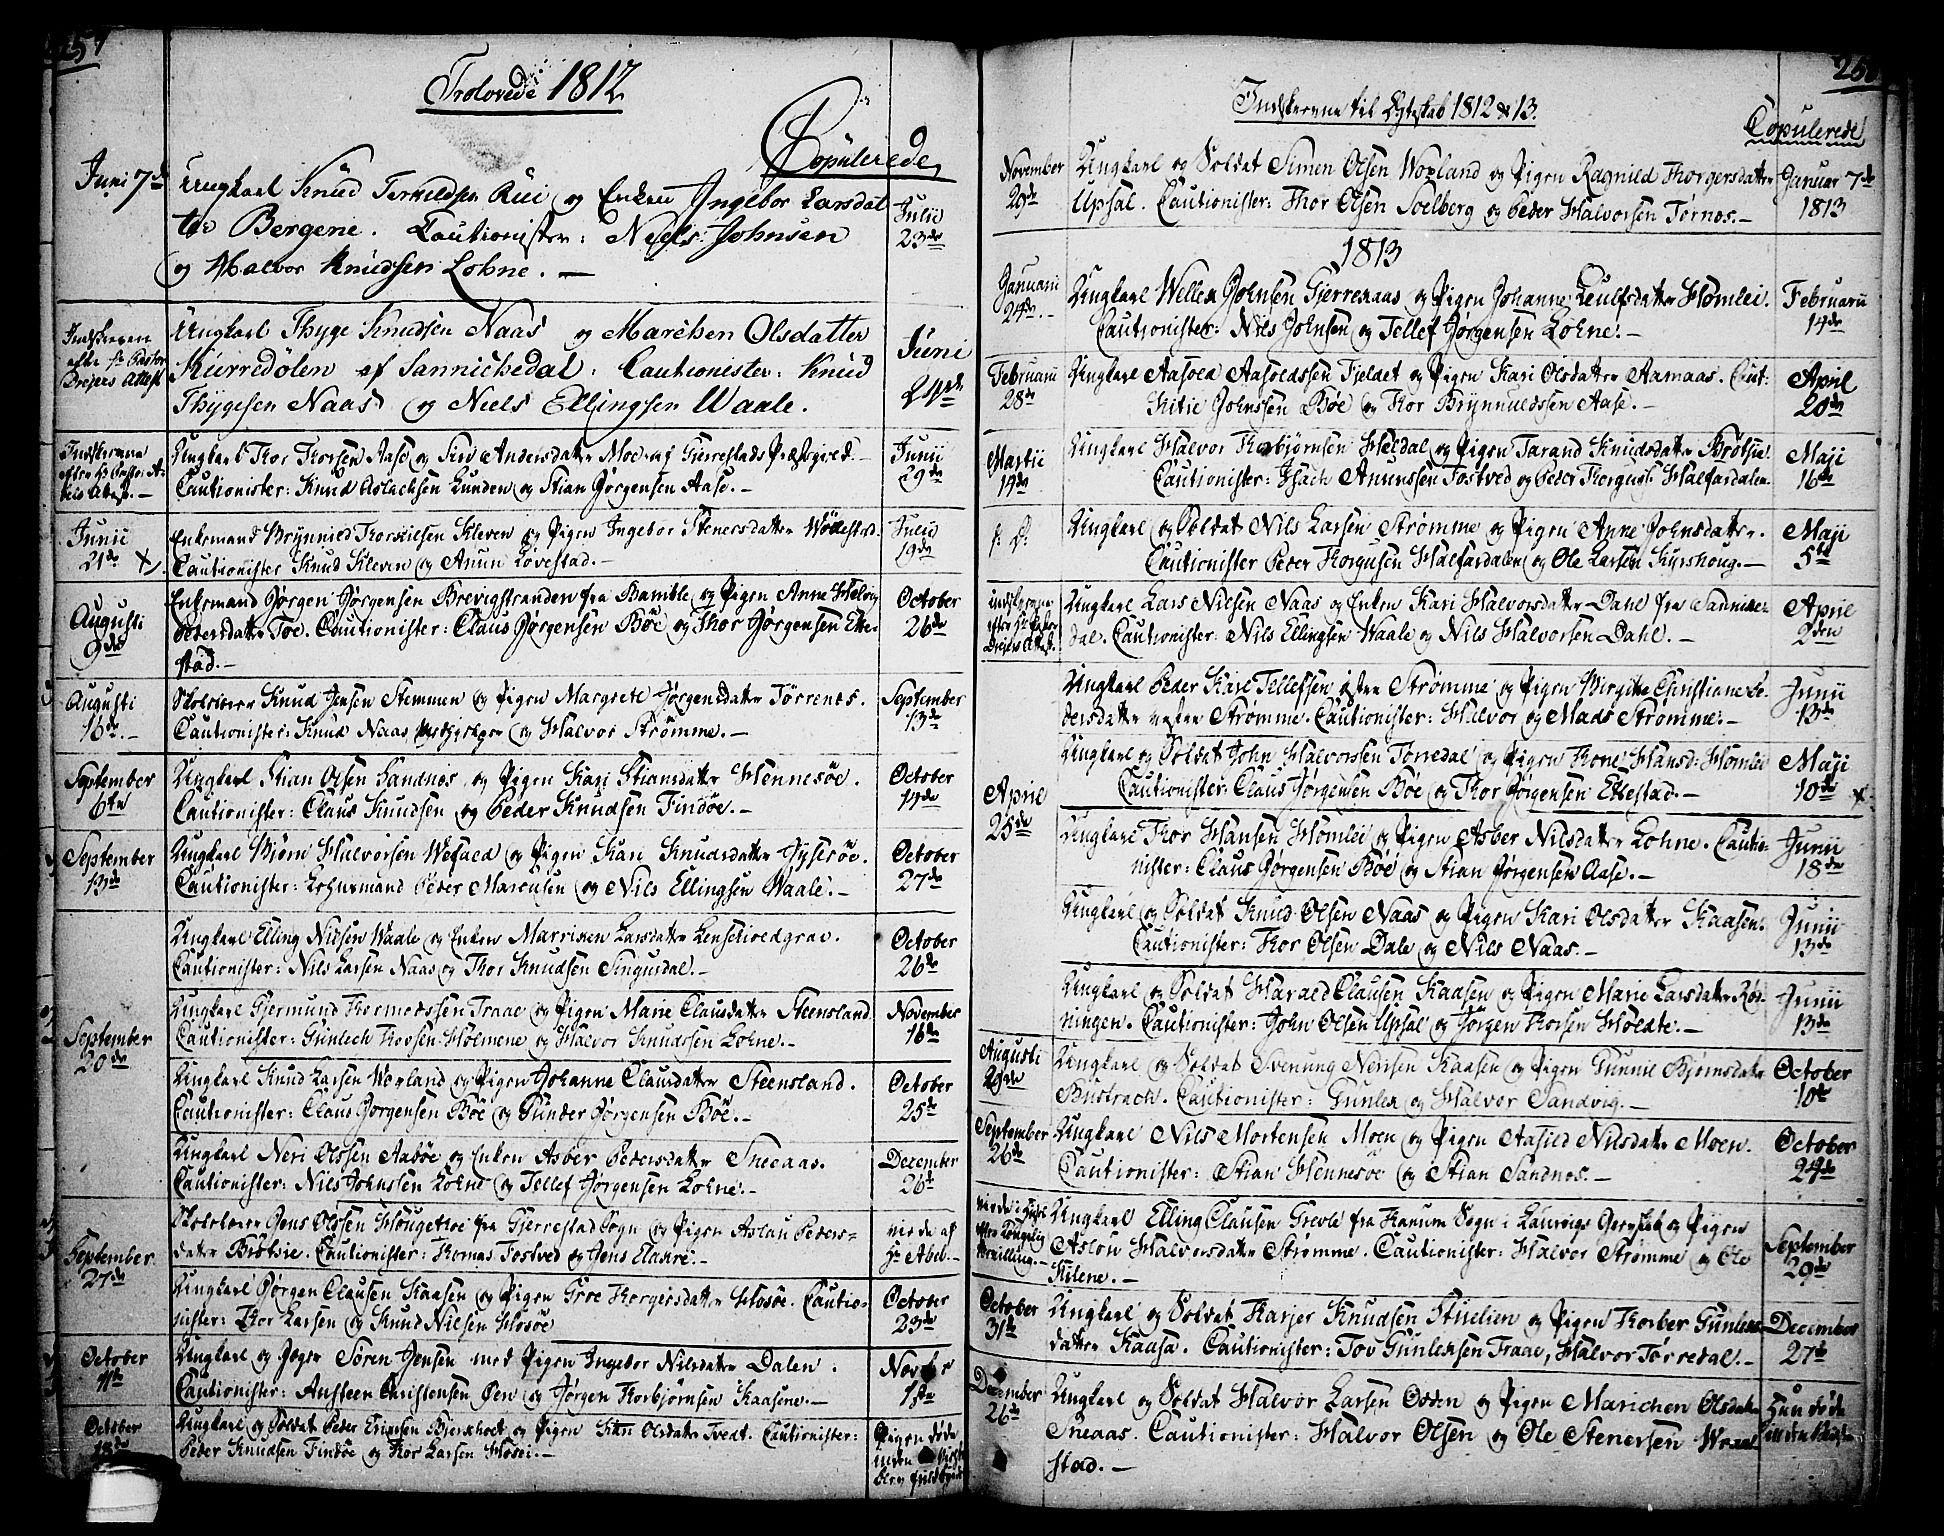 SAKO, Drangedal kirkebøker, F/Fa/L0003: Ministerialbok nr. 3, 1768-1814, s. 257-258